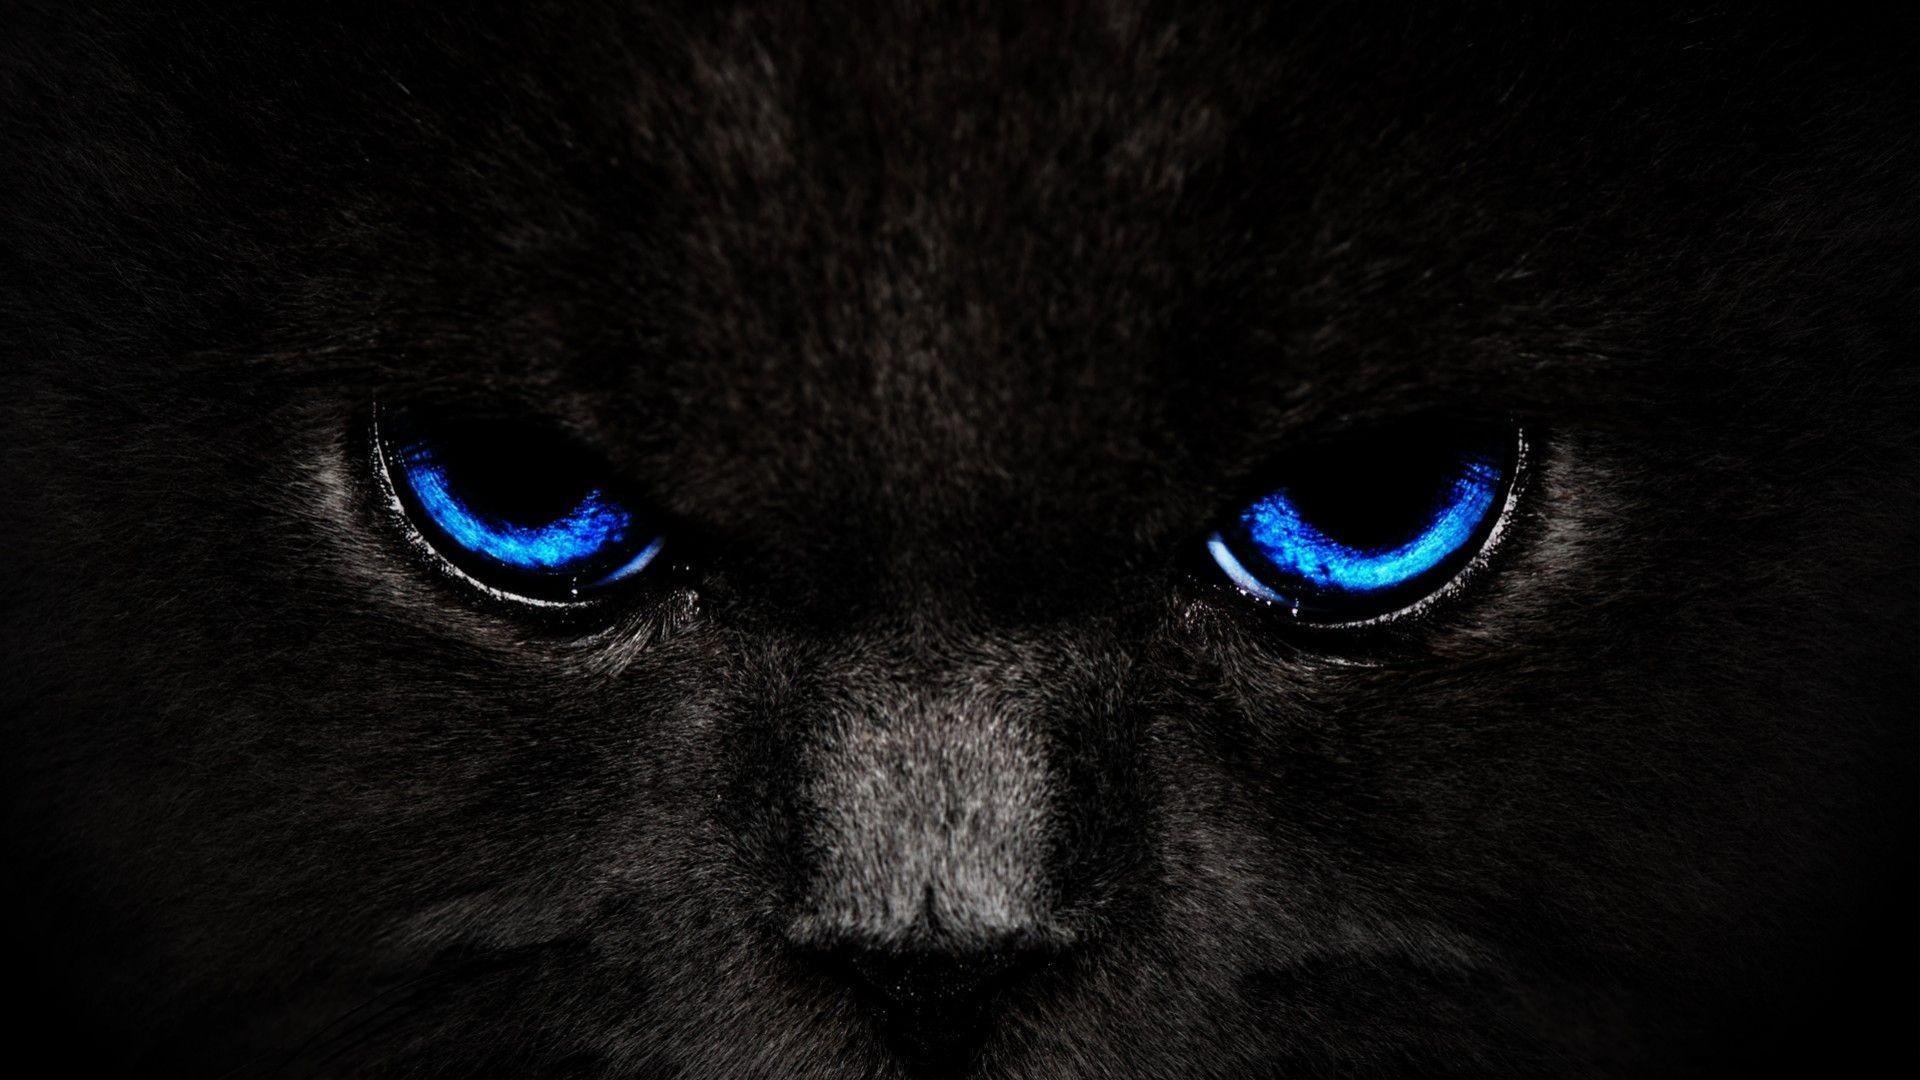 Cats Wallpapers S Hd Black Cat Blue Eyes Wallpaper